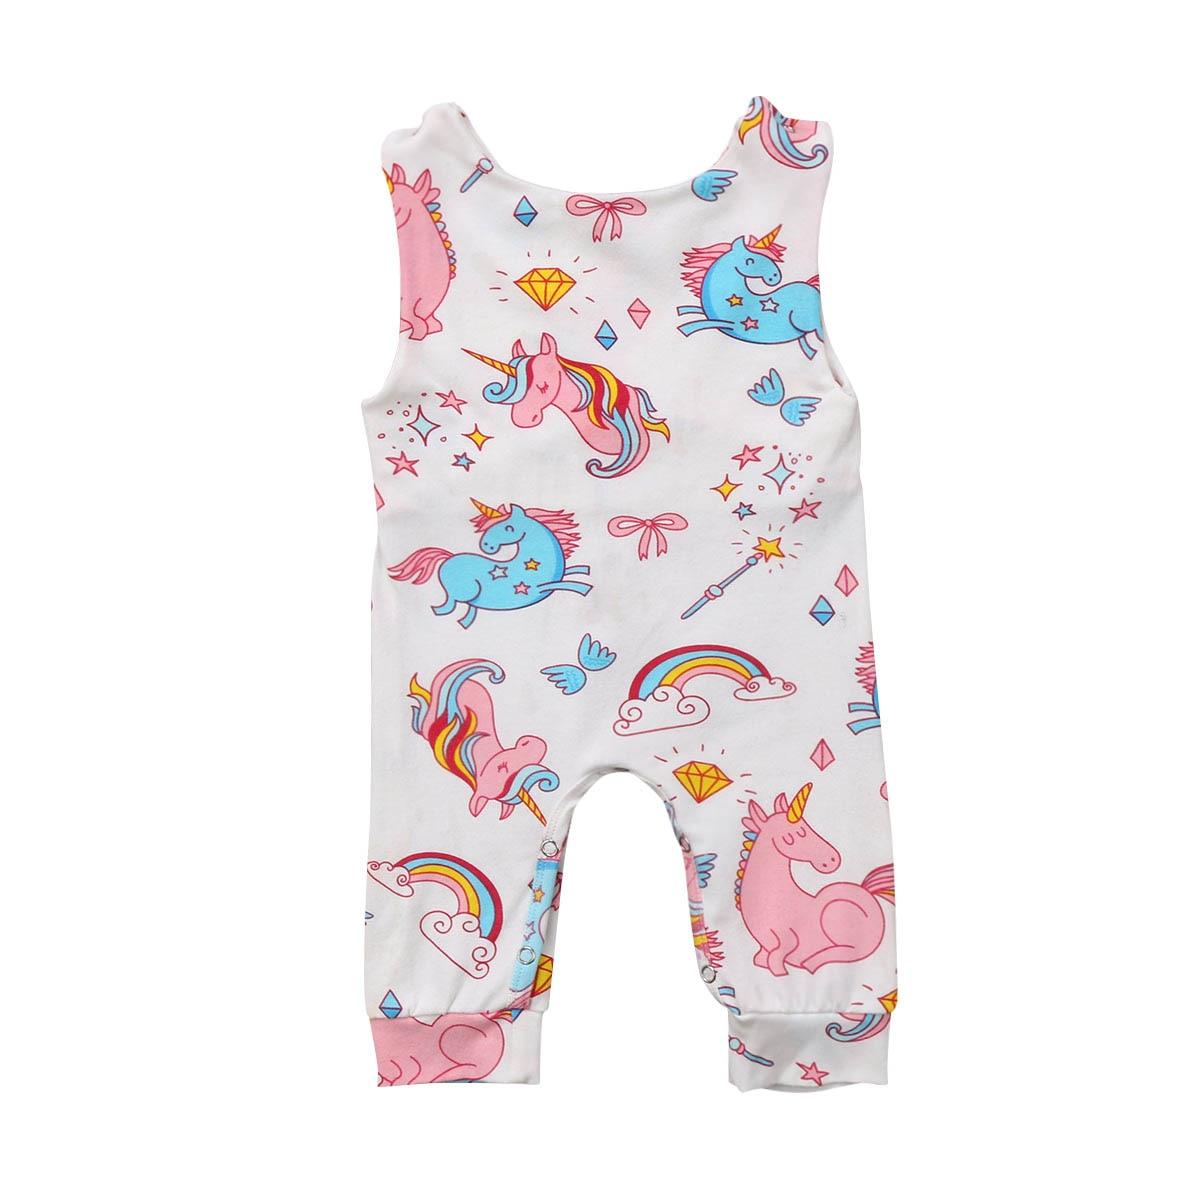 47c04c4d8d80 HOT SALE ~ Newborn Toddler Baby Girl Boy Unicorn Romper Clothes ...